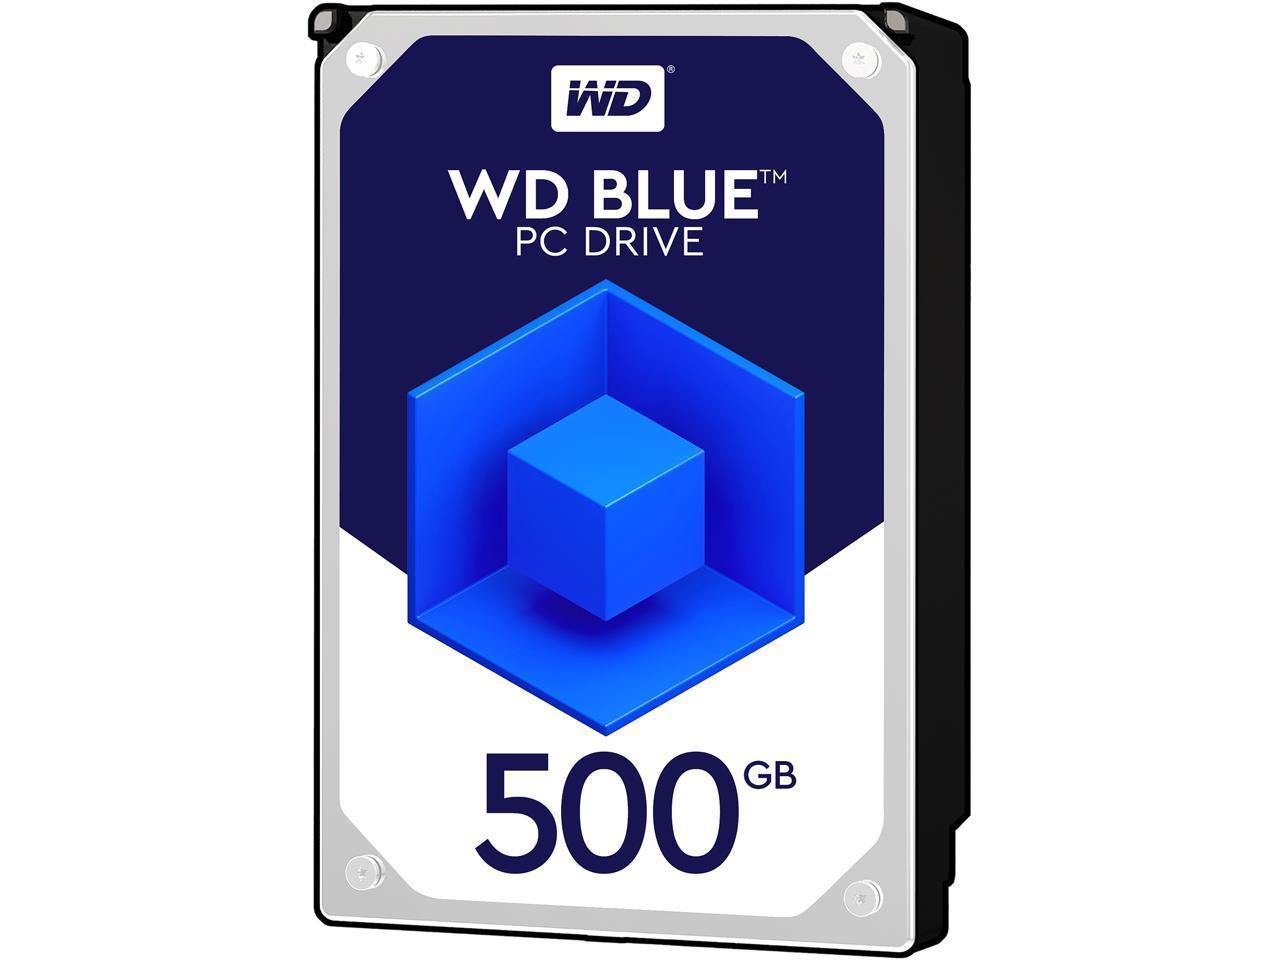 Хард диск WD Blue, 500GB, 7200rpm, 64MB, SATA 3, WD5000AAKX